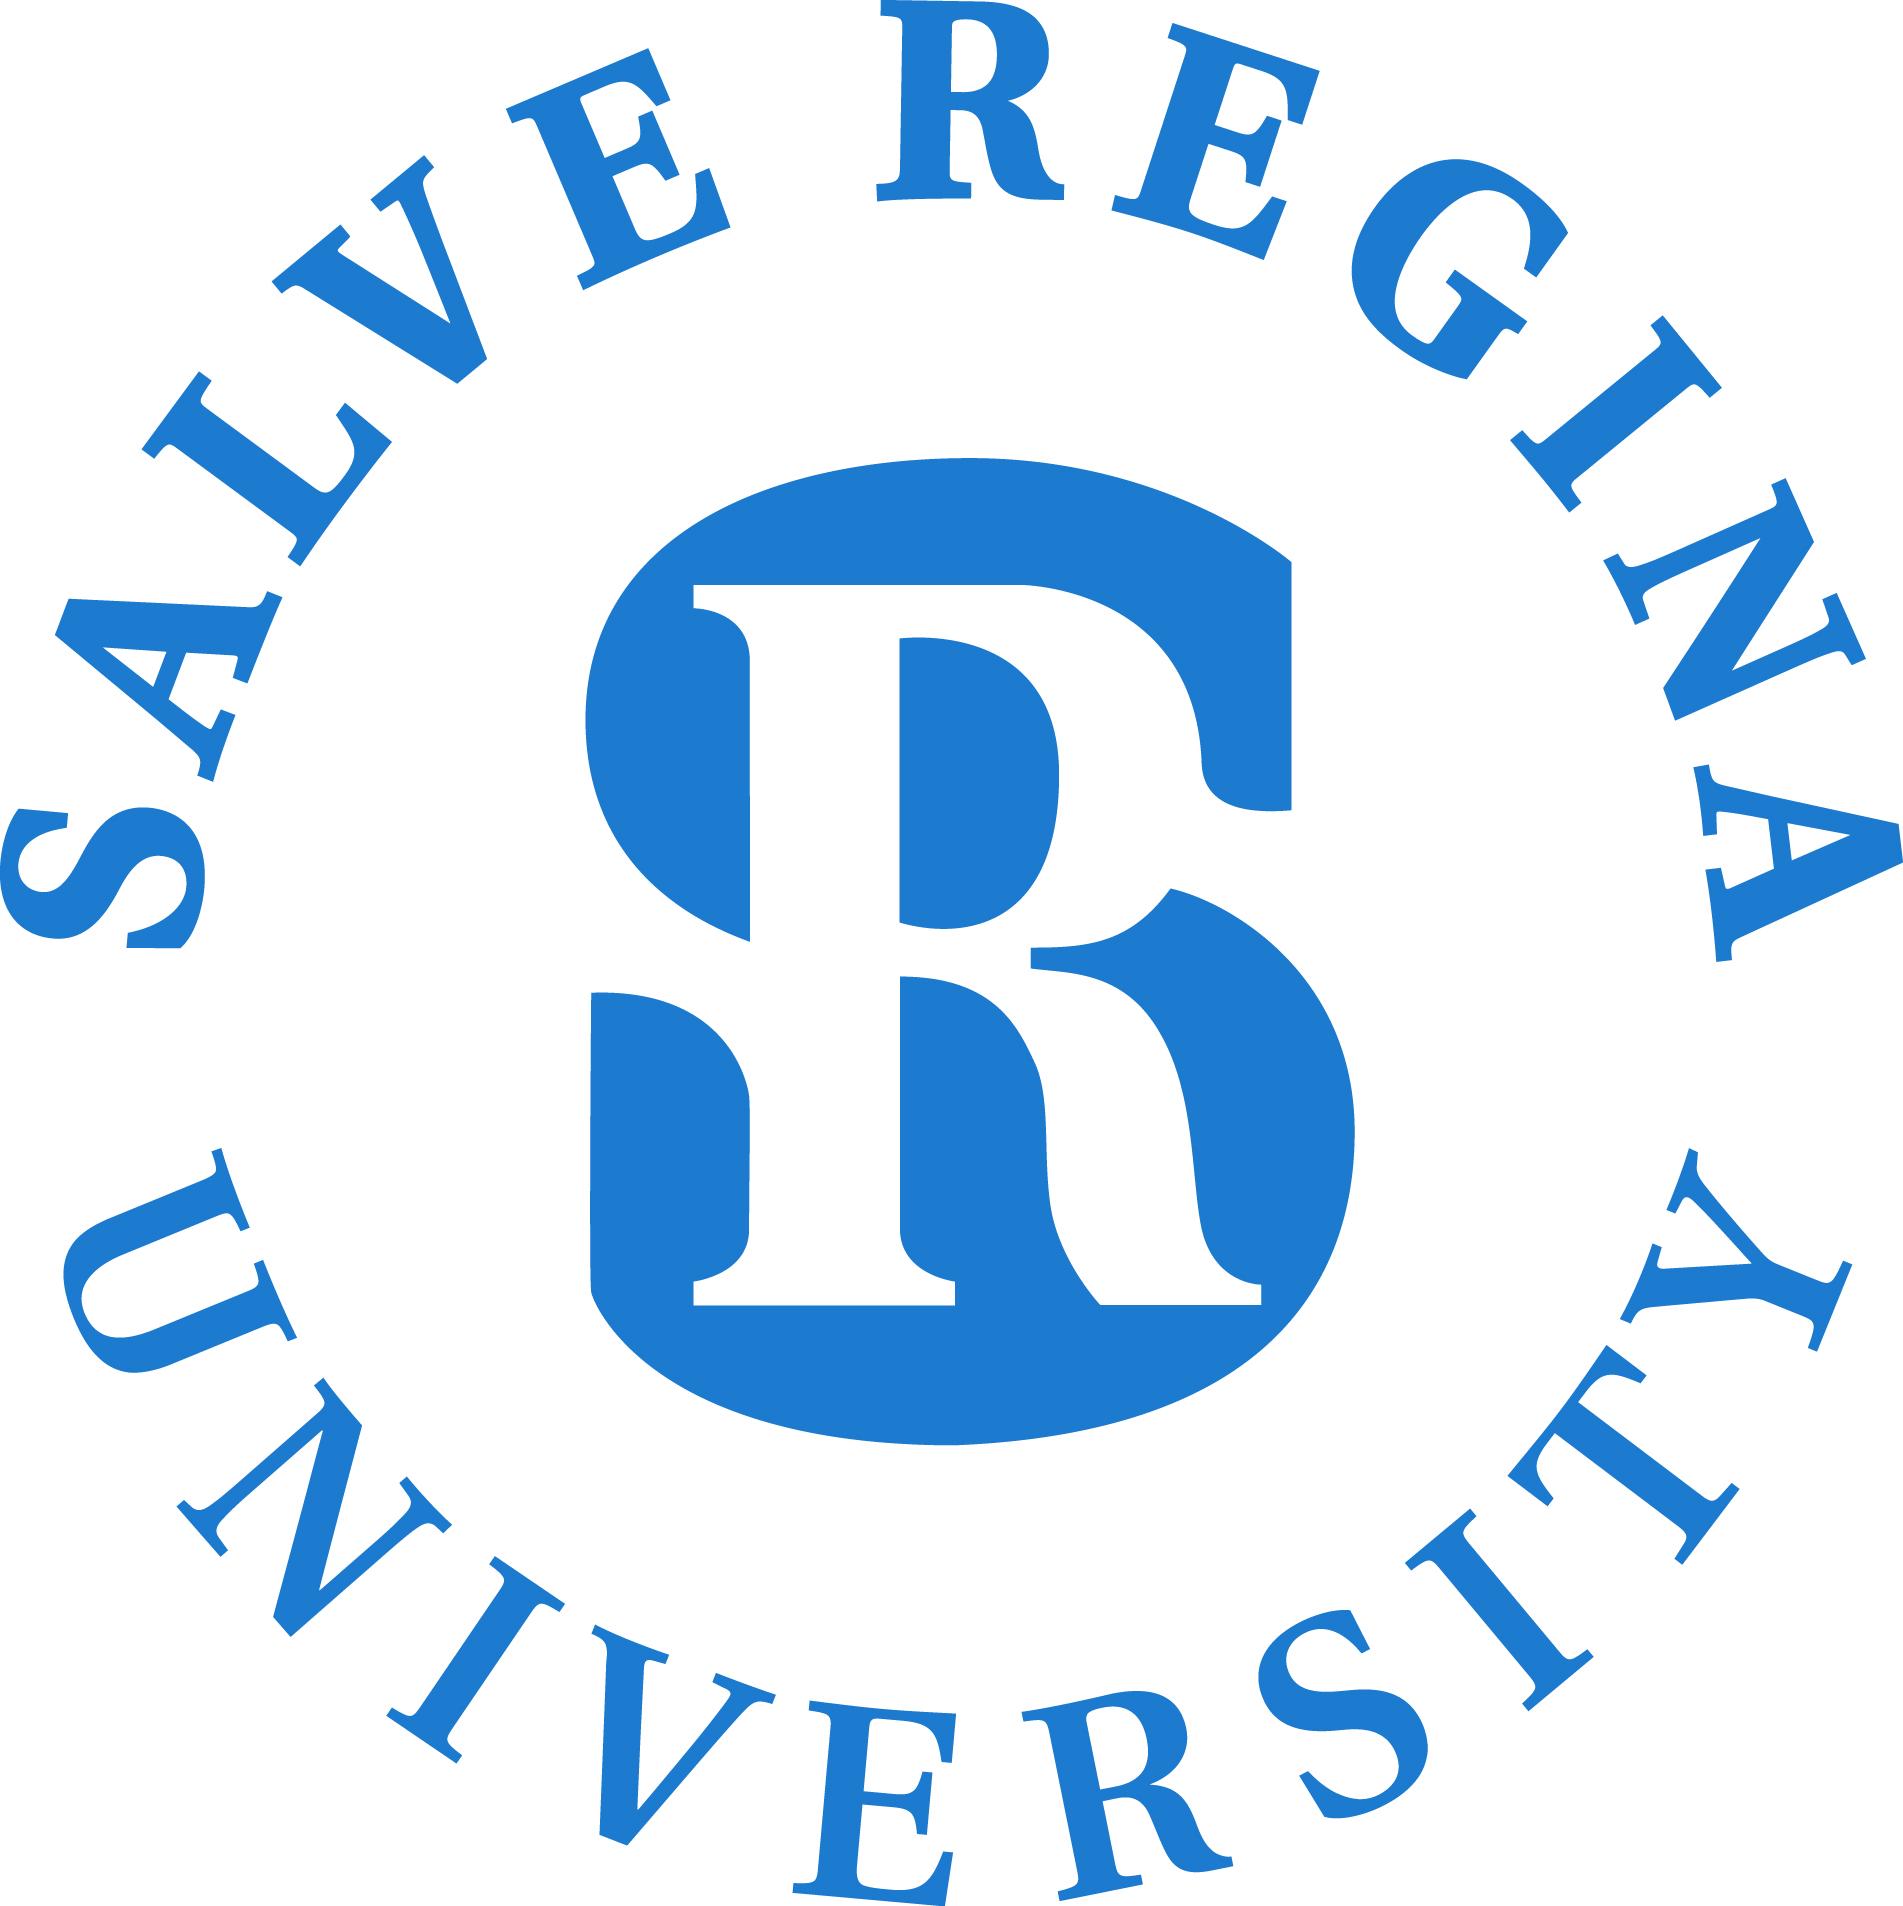 LOGO_Salve Regina University.jpg